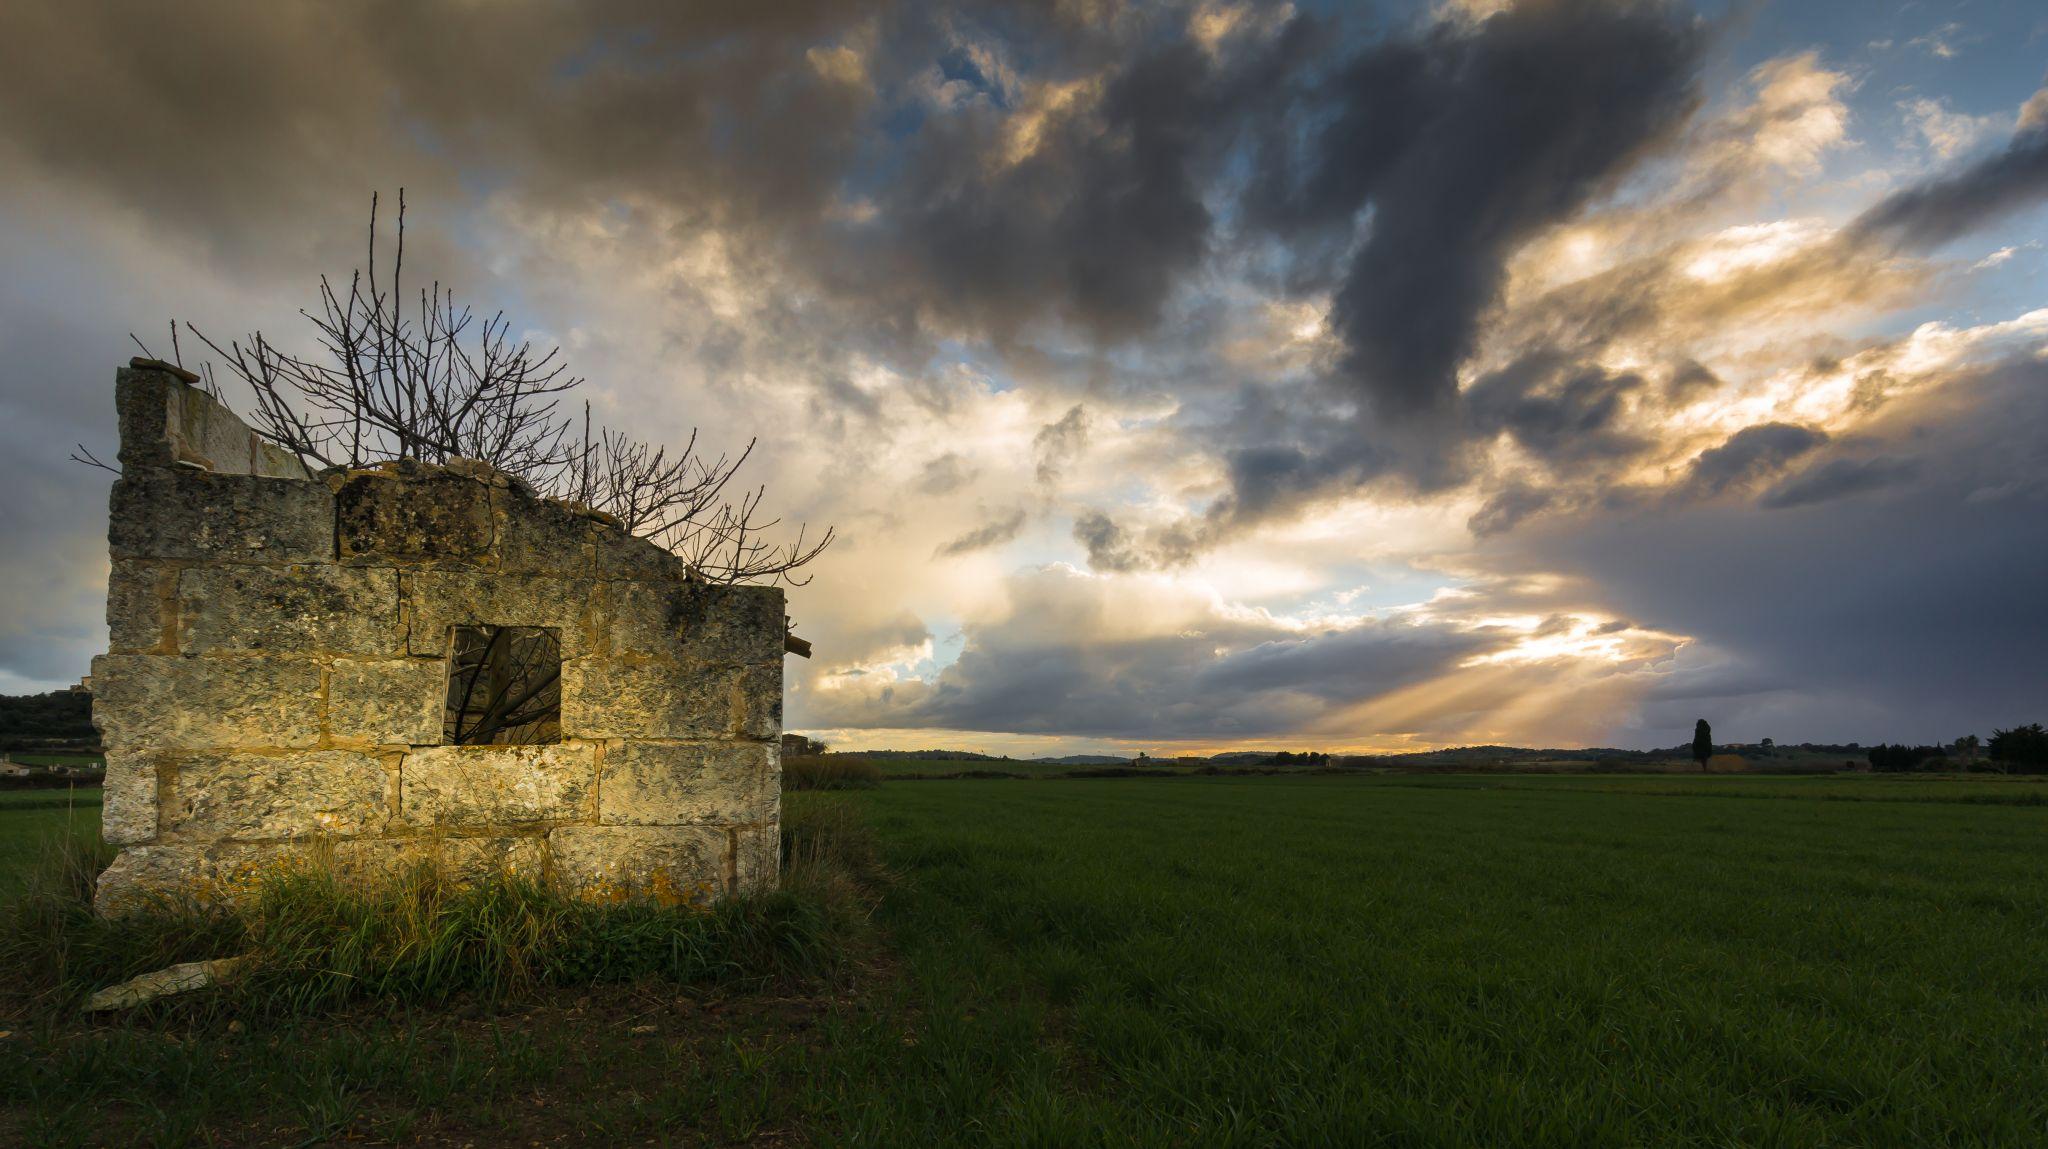 Mallorquin countryside, Spain